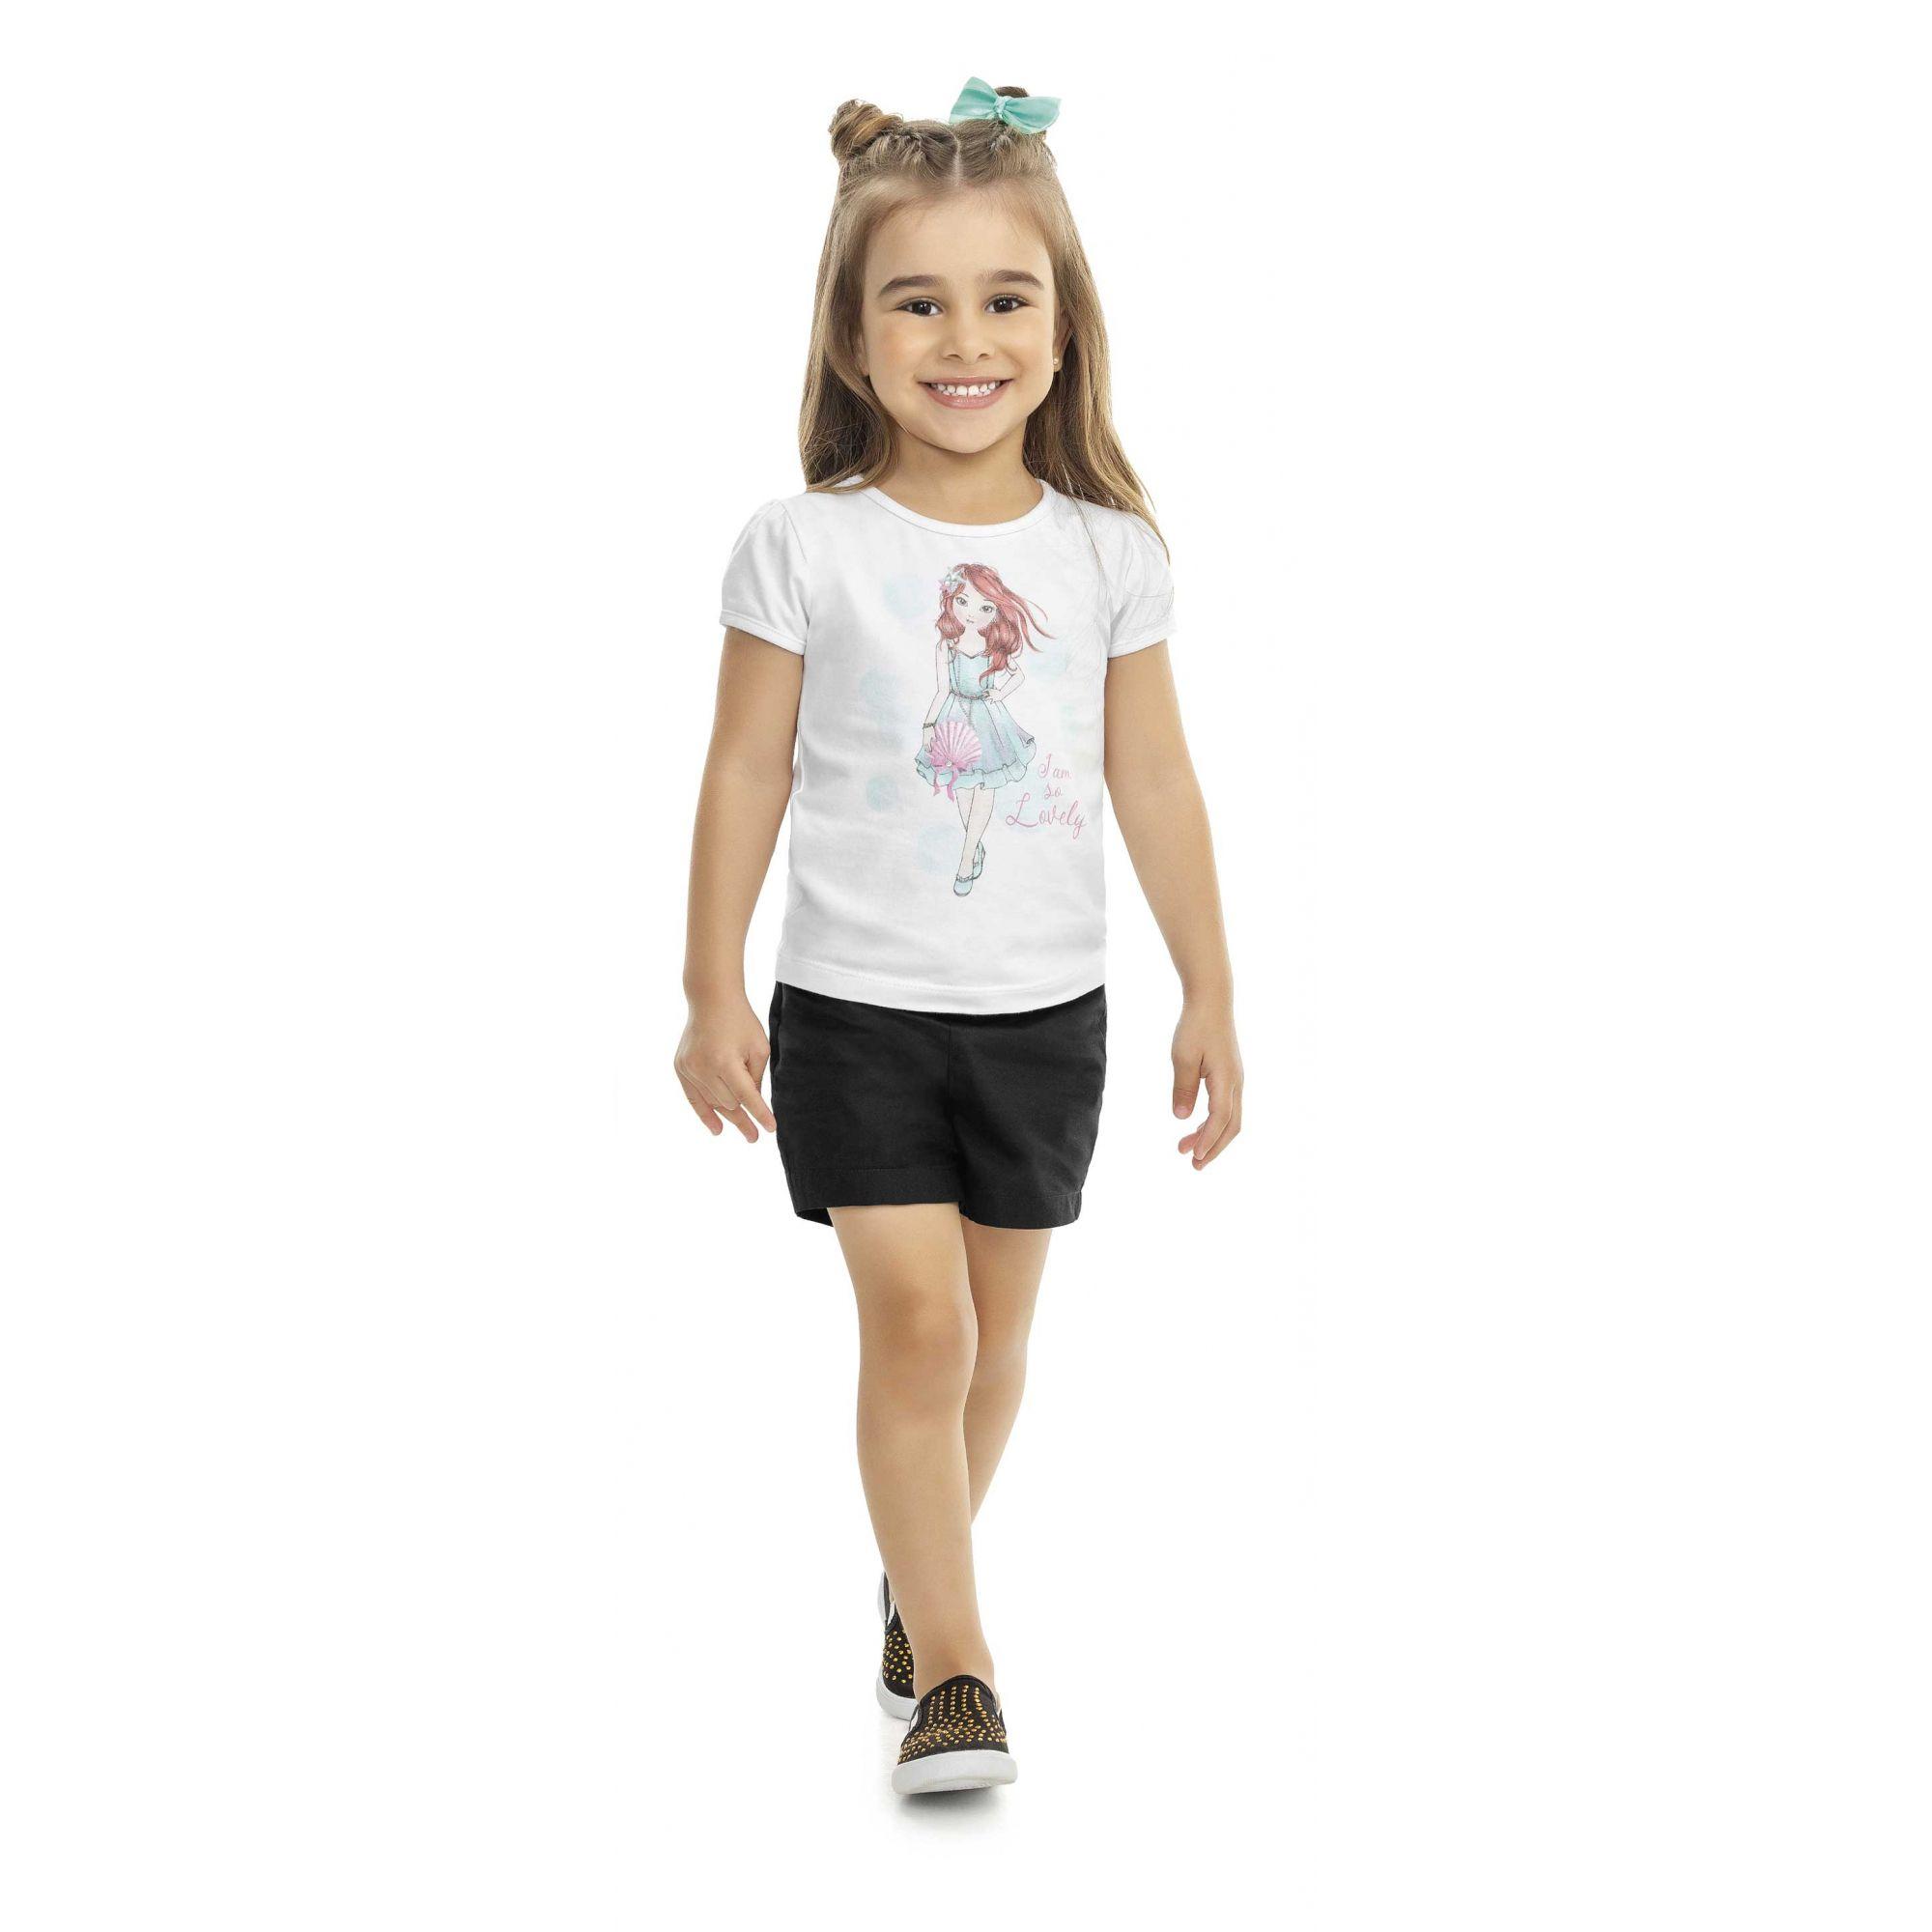 Blusa Infantil Verão Menina - Kaiani